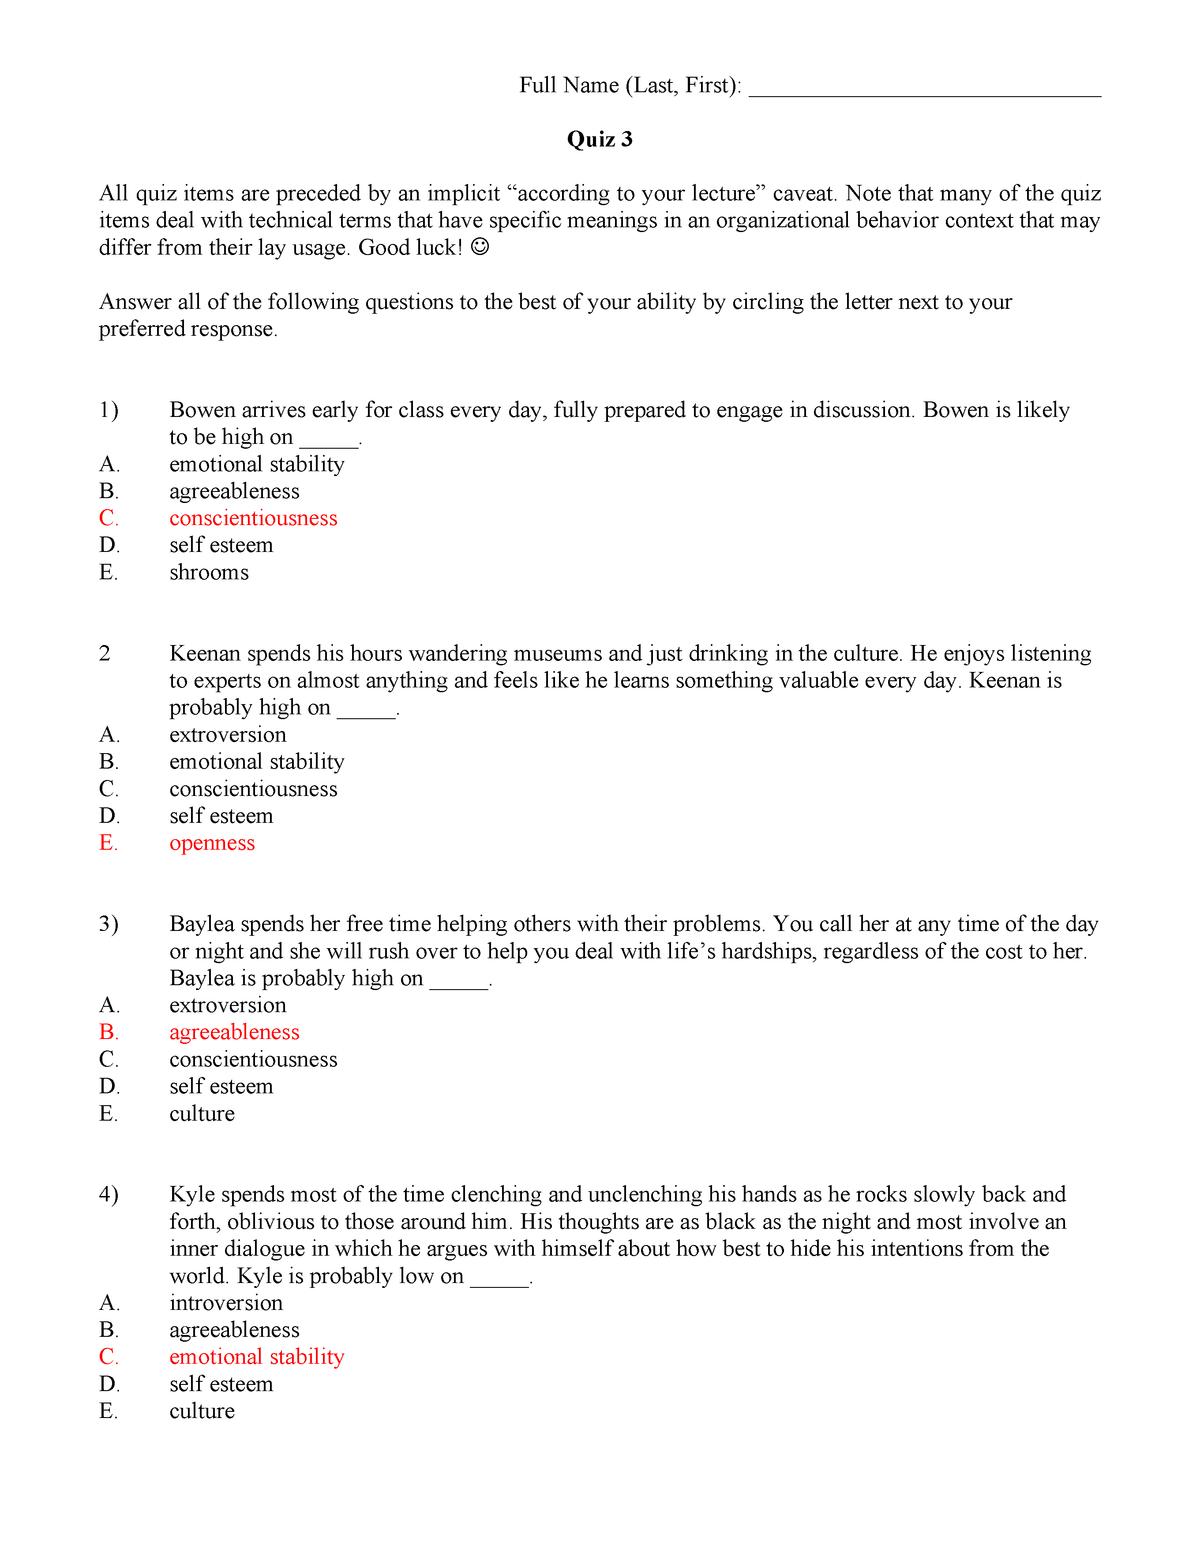 Exam 2018 - MGT 3681: Honors Human Behavior - StuDocu